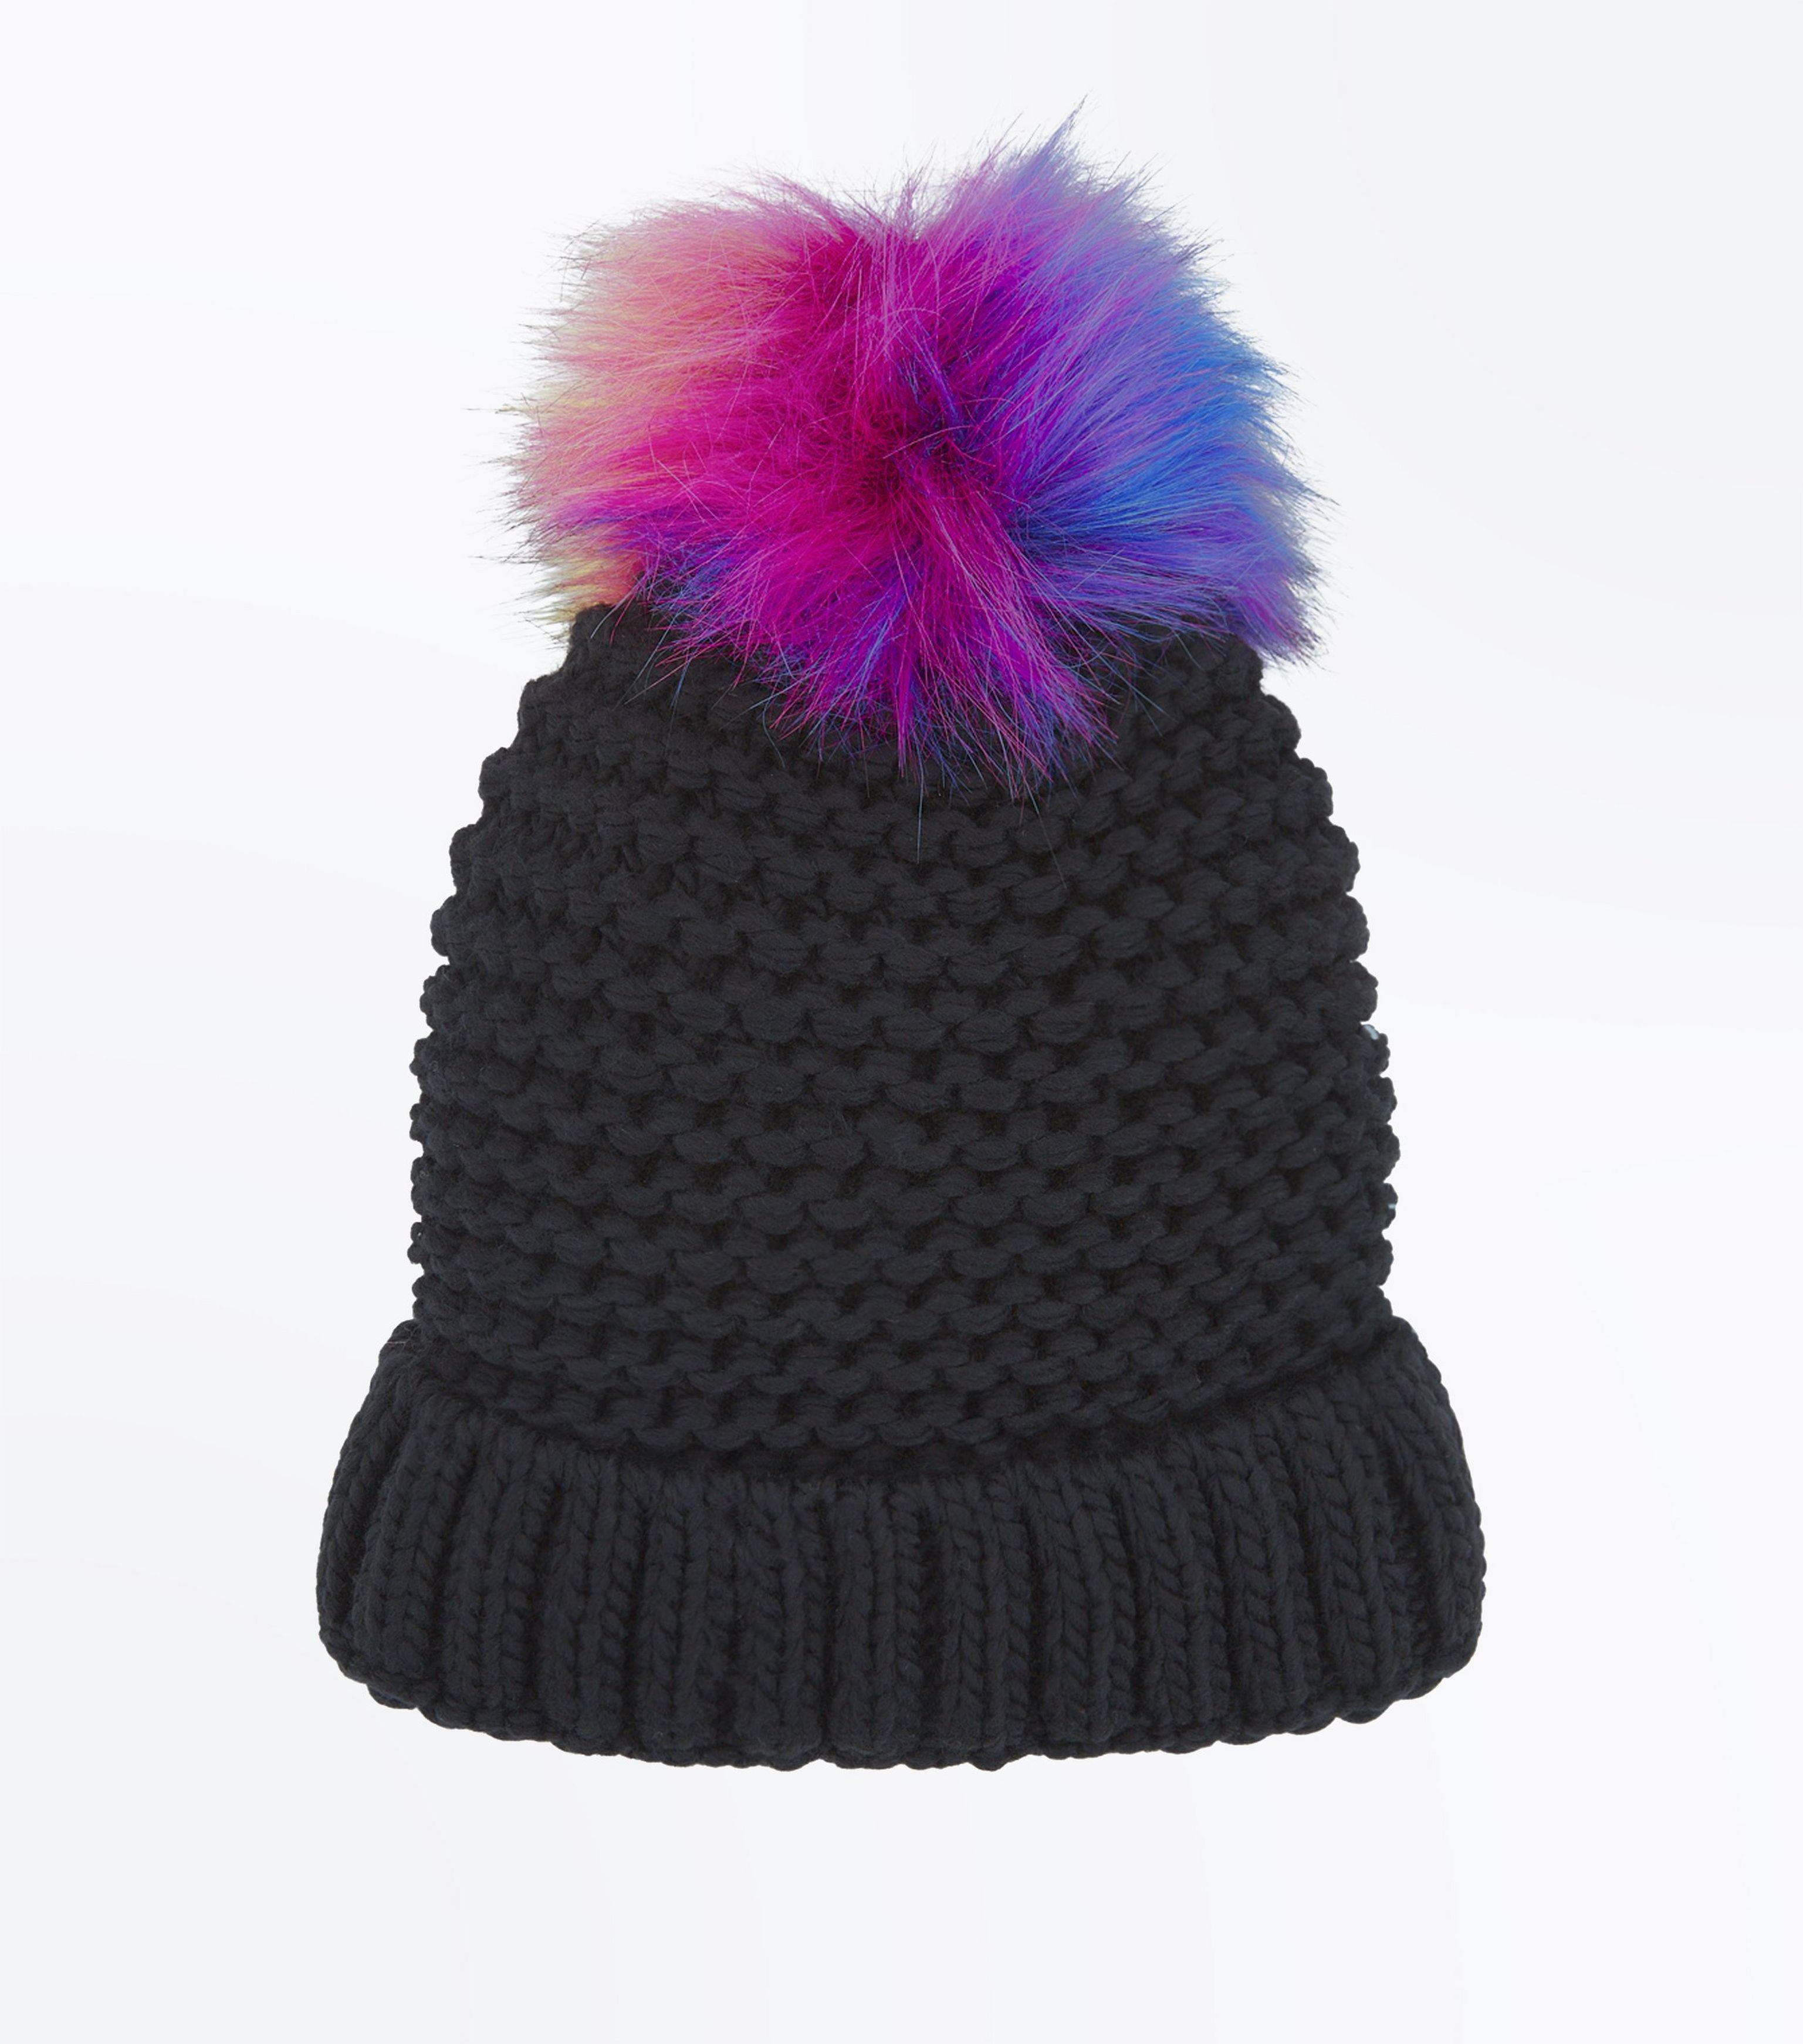 1c8ac2ebea1bb New Look Black Faux Fur Pom Pom Bobble Beanie in Black - Lyst